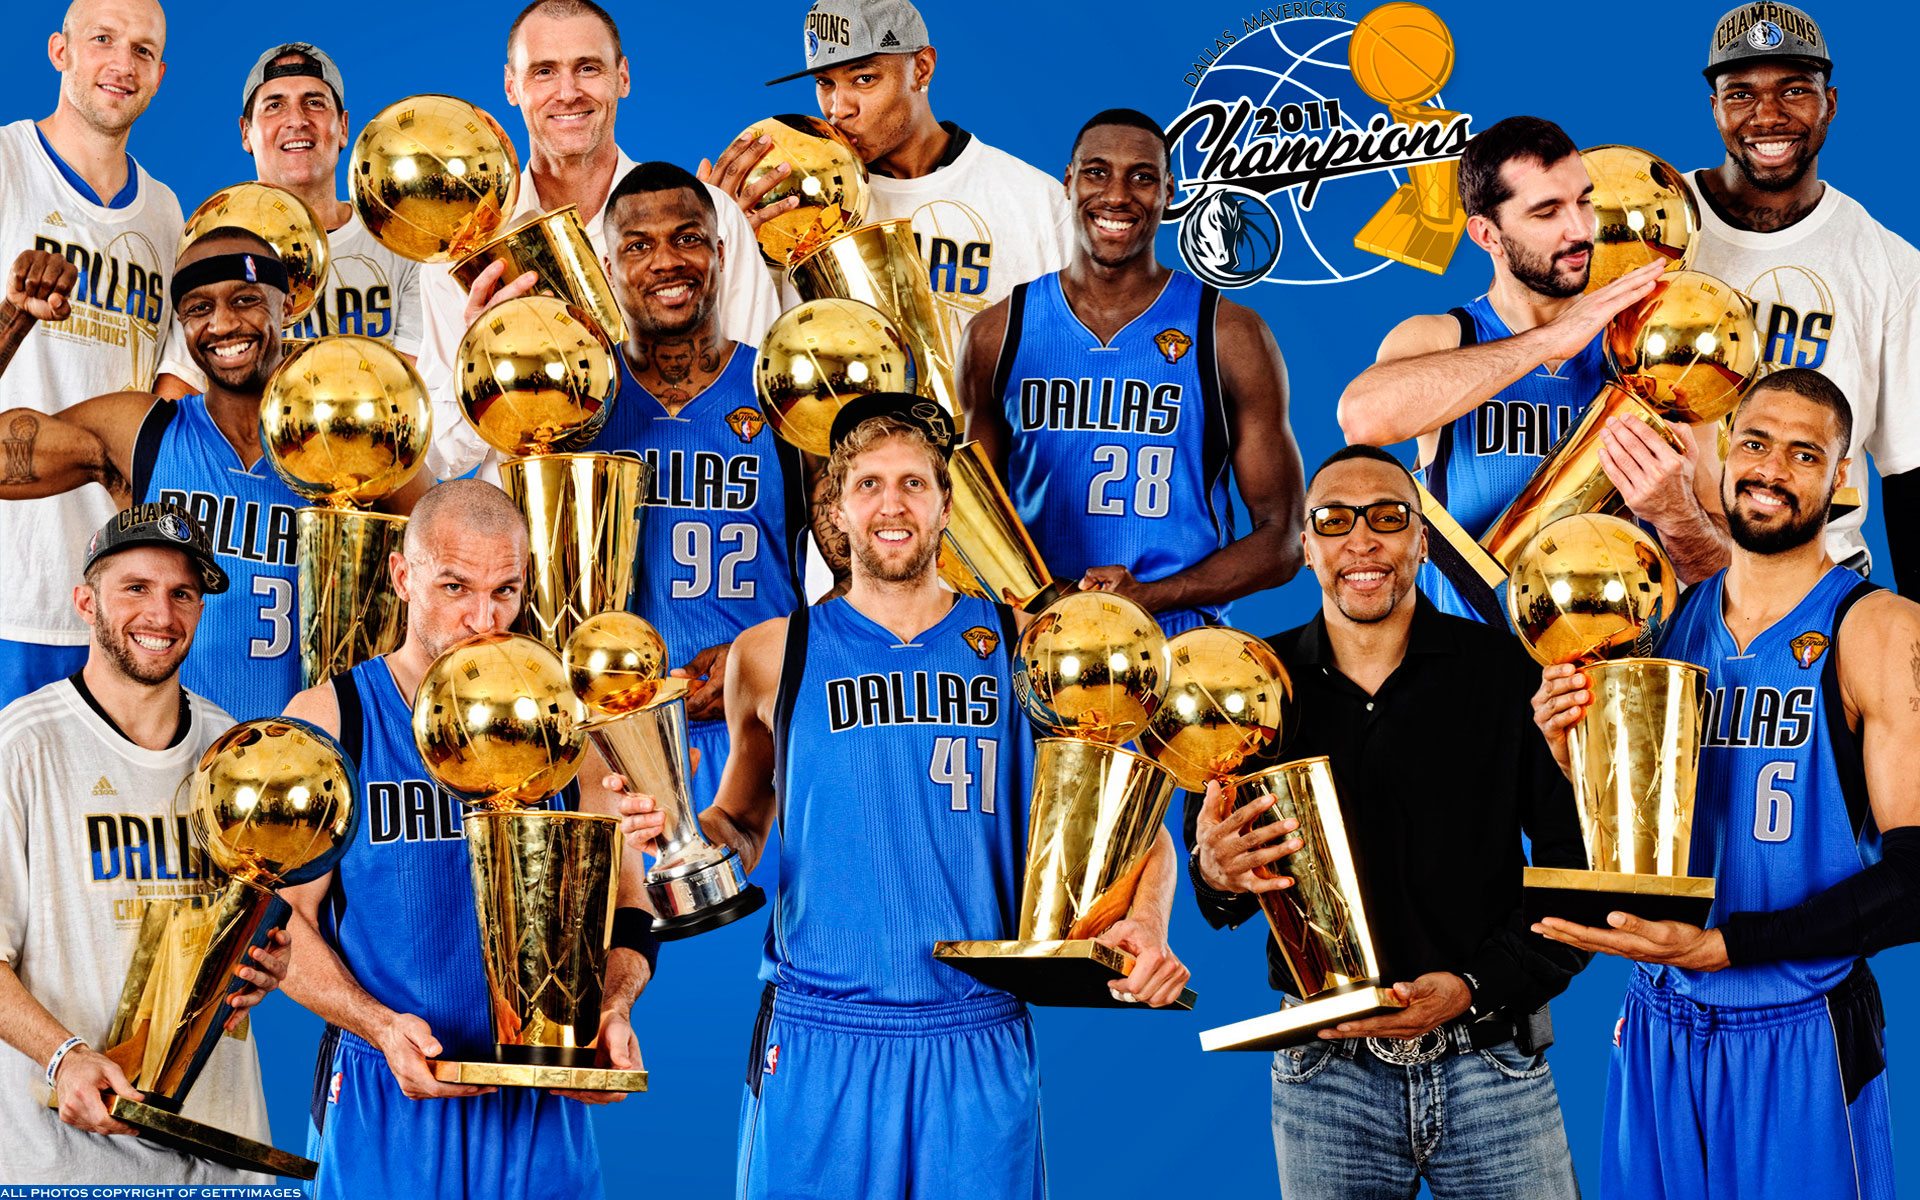 Dallas Mavericks 2011 NBA Champions | Chris L Diaz